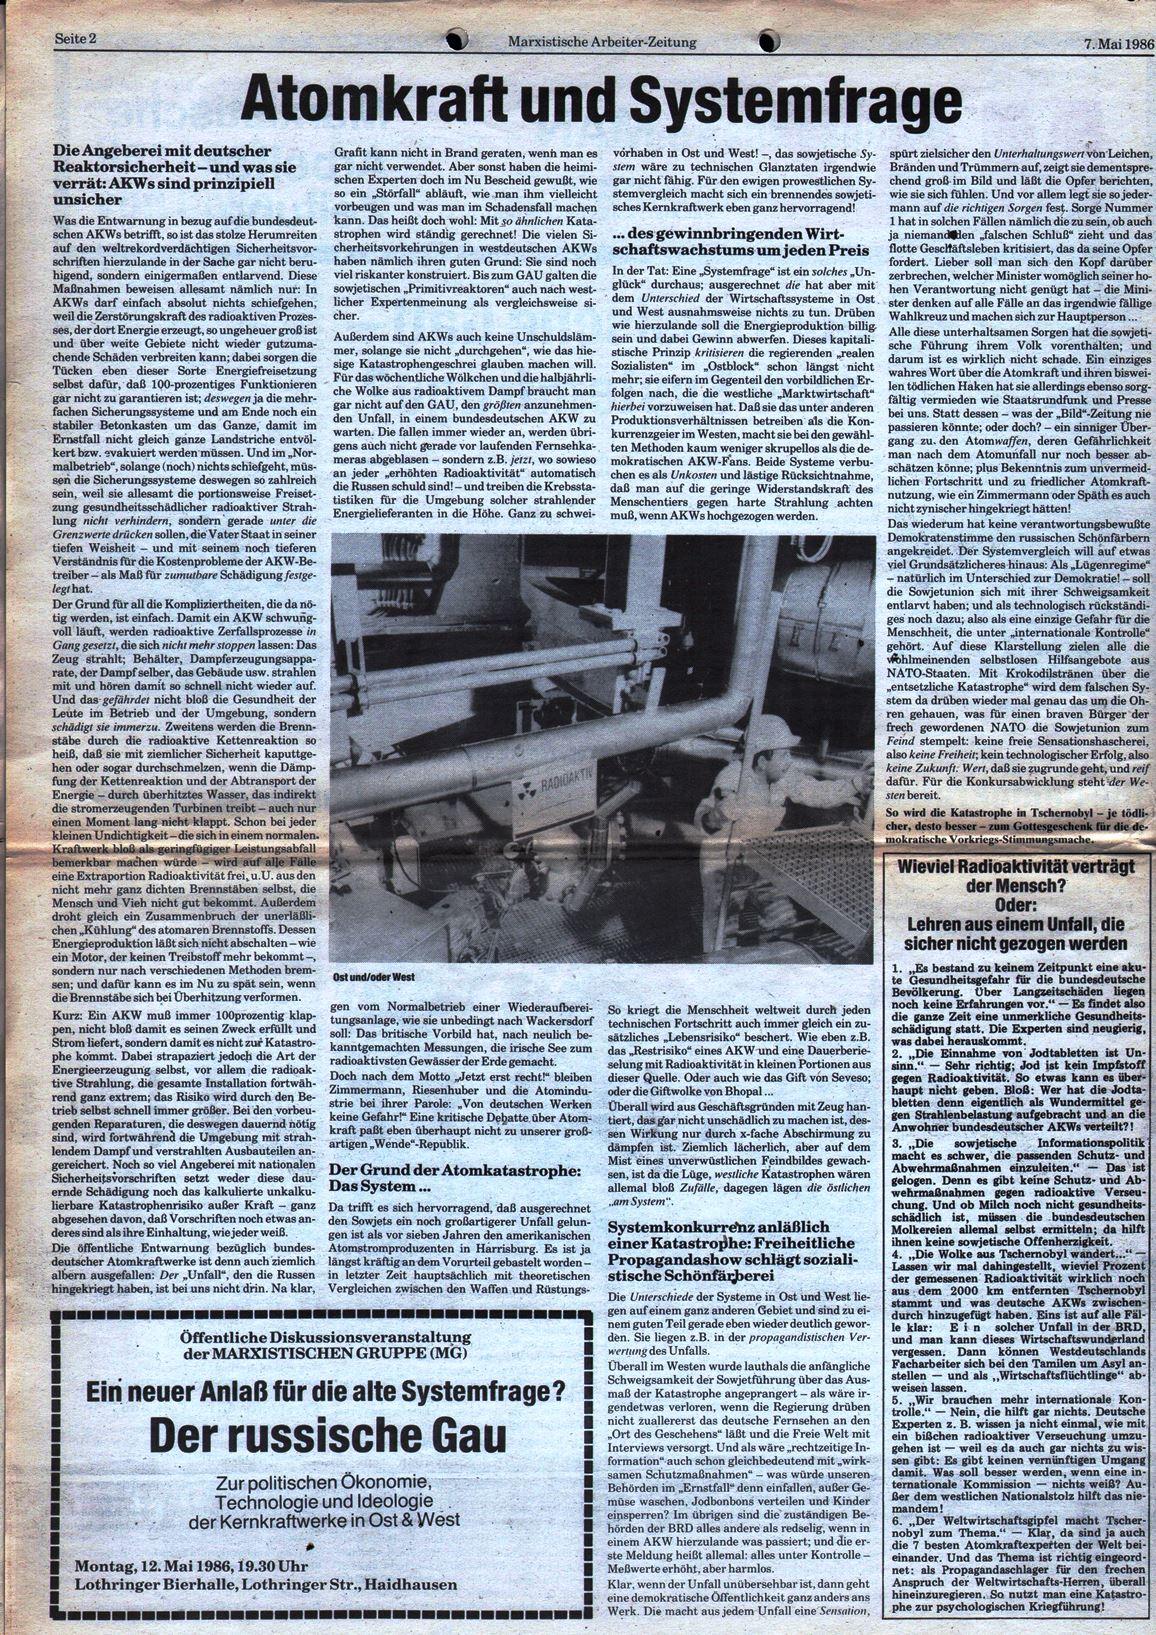 Muenchen_MG_MAZ_MAN_19860320_02